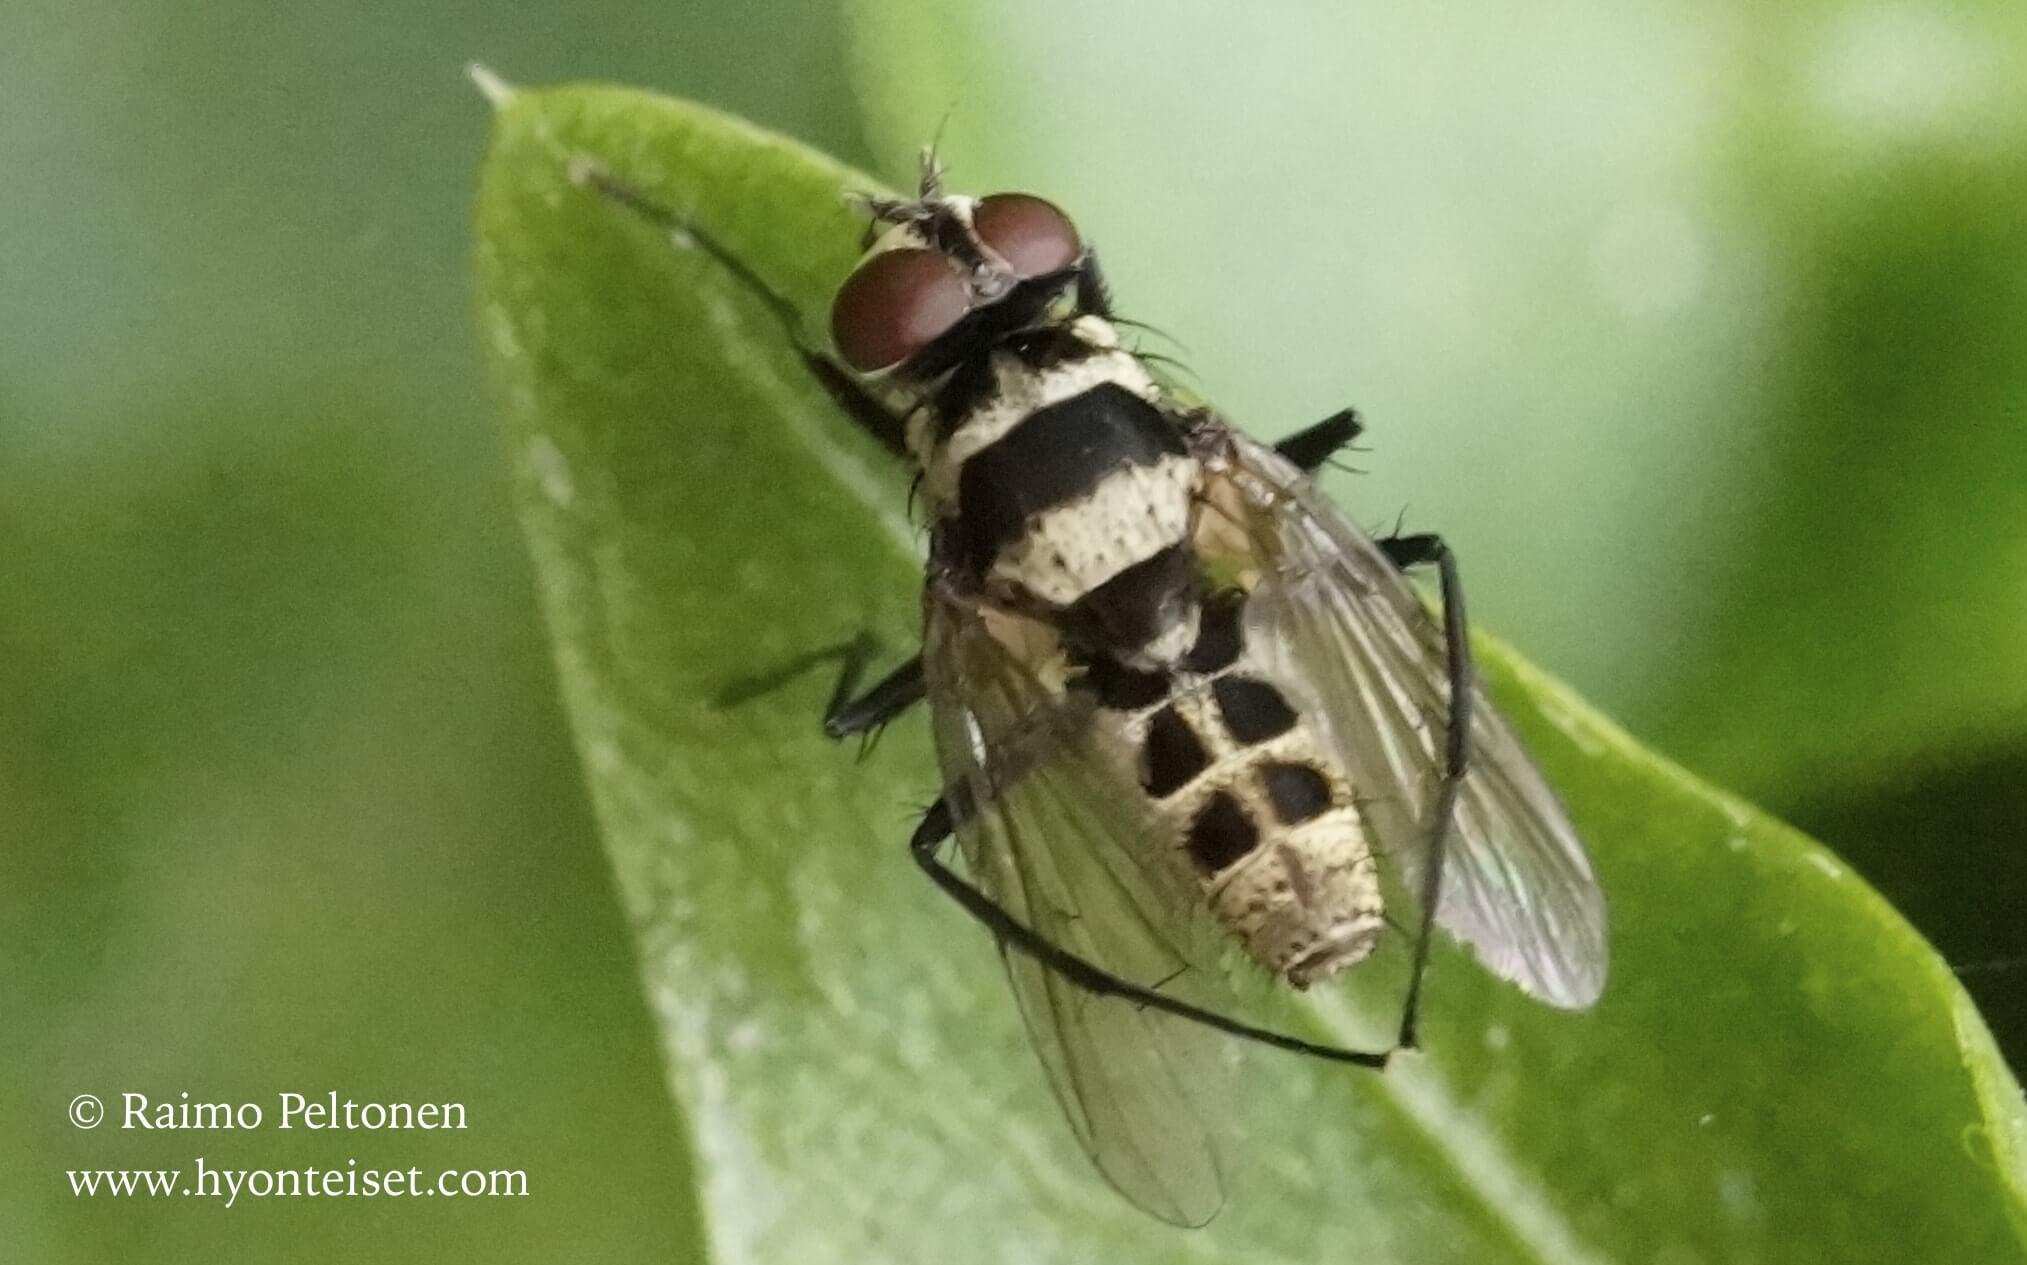 Limnophora quaterna, koiras (Muscidae) (det. Piluca Alvarez) GRAN CANARIA